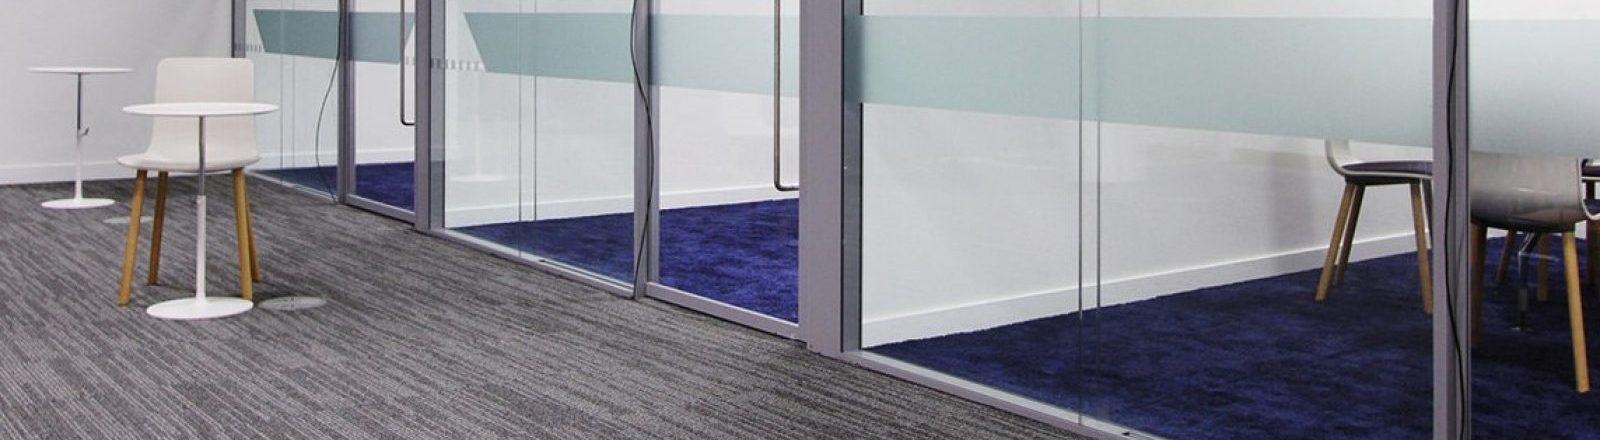 commercial flooring in birmingham